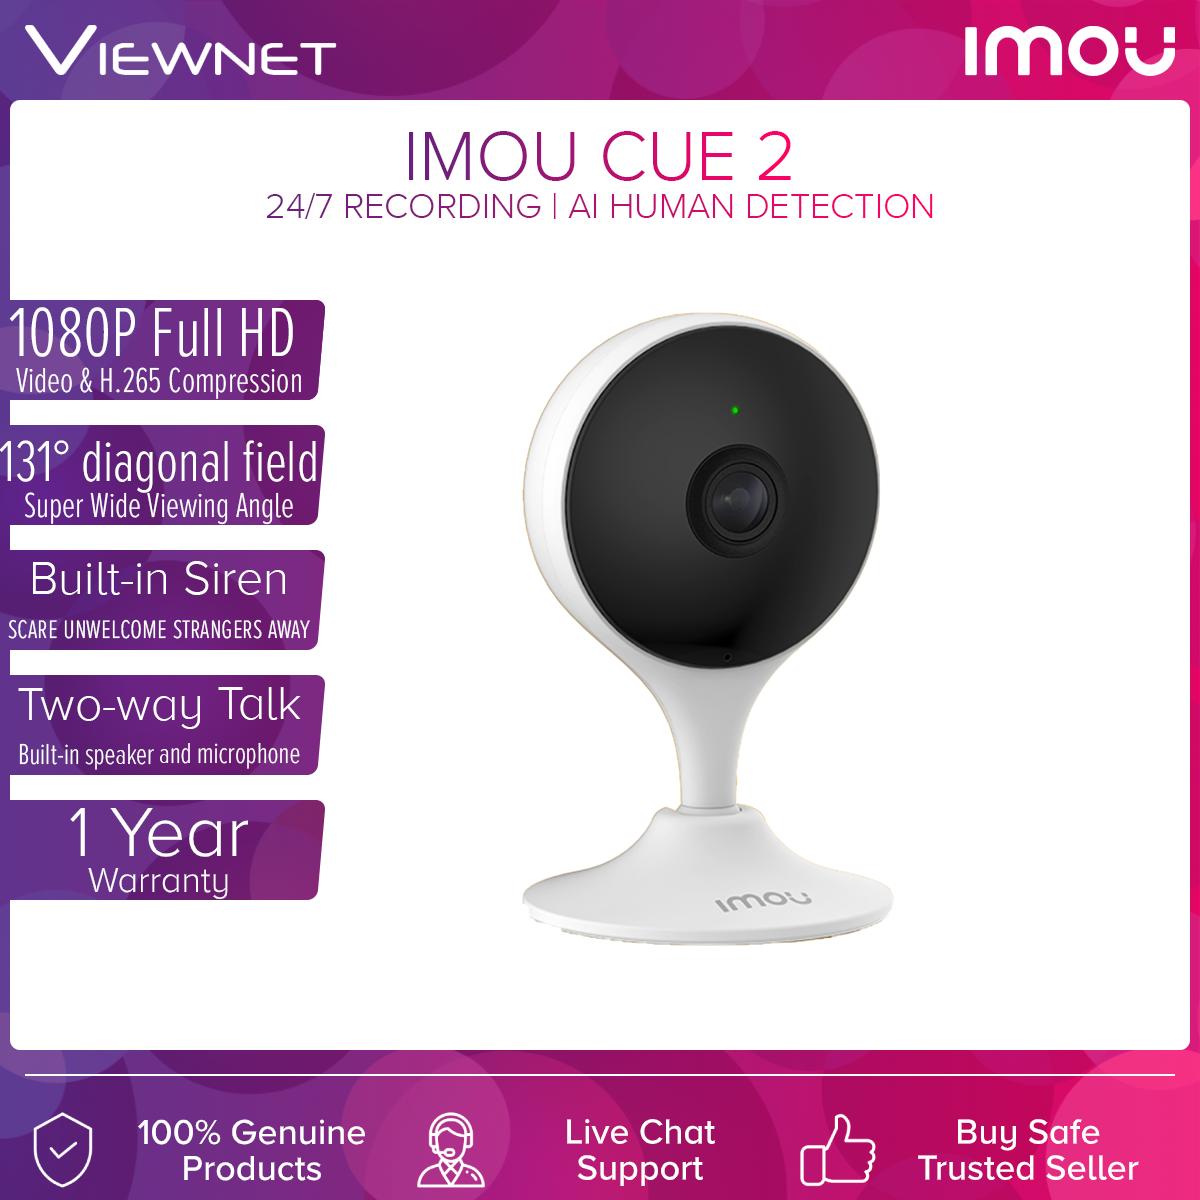 DAHUA IMOU Cue 2c 1080P Full HD Smart Monitoring Cloud Wireless WiFi IP Camera with AI Human Detection (Surveillance CCTV) CUE 2